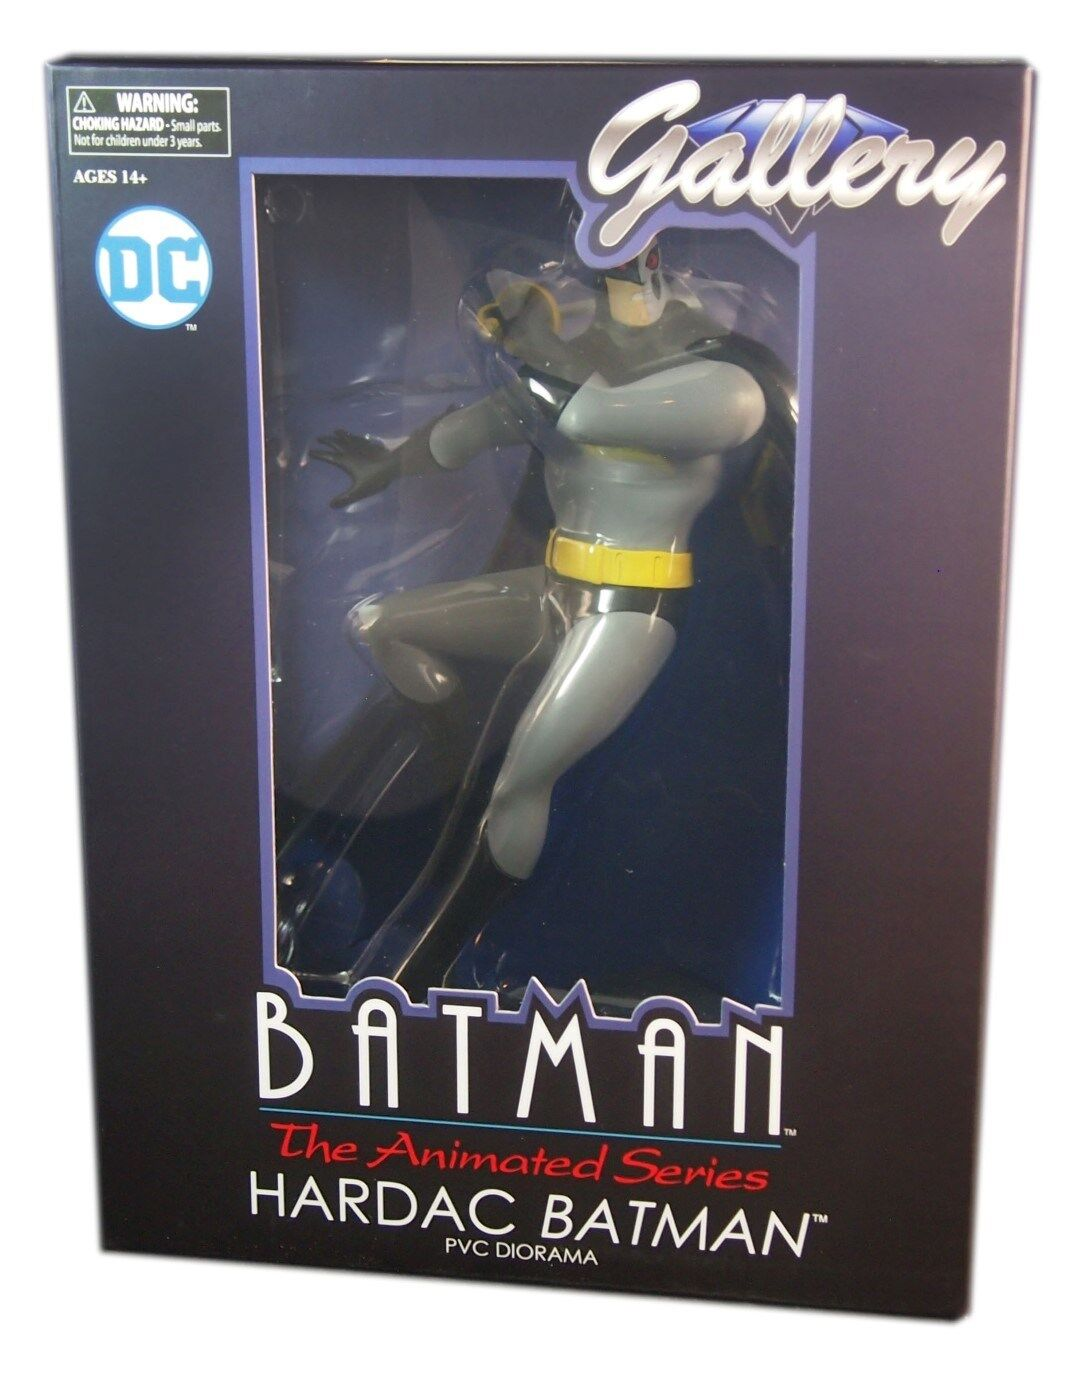 Diamond Select DC Gallery, Hardac Batman PVC Figure 11 inch, New  and Sealed